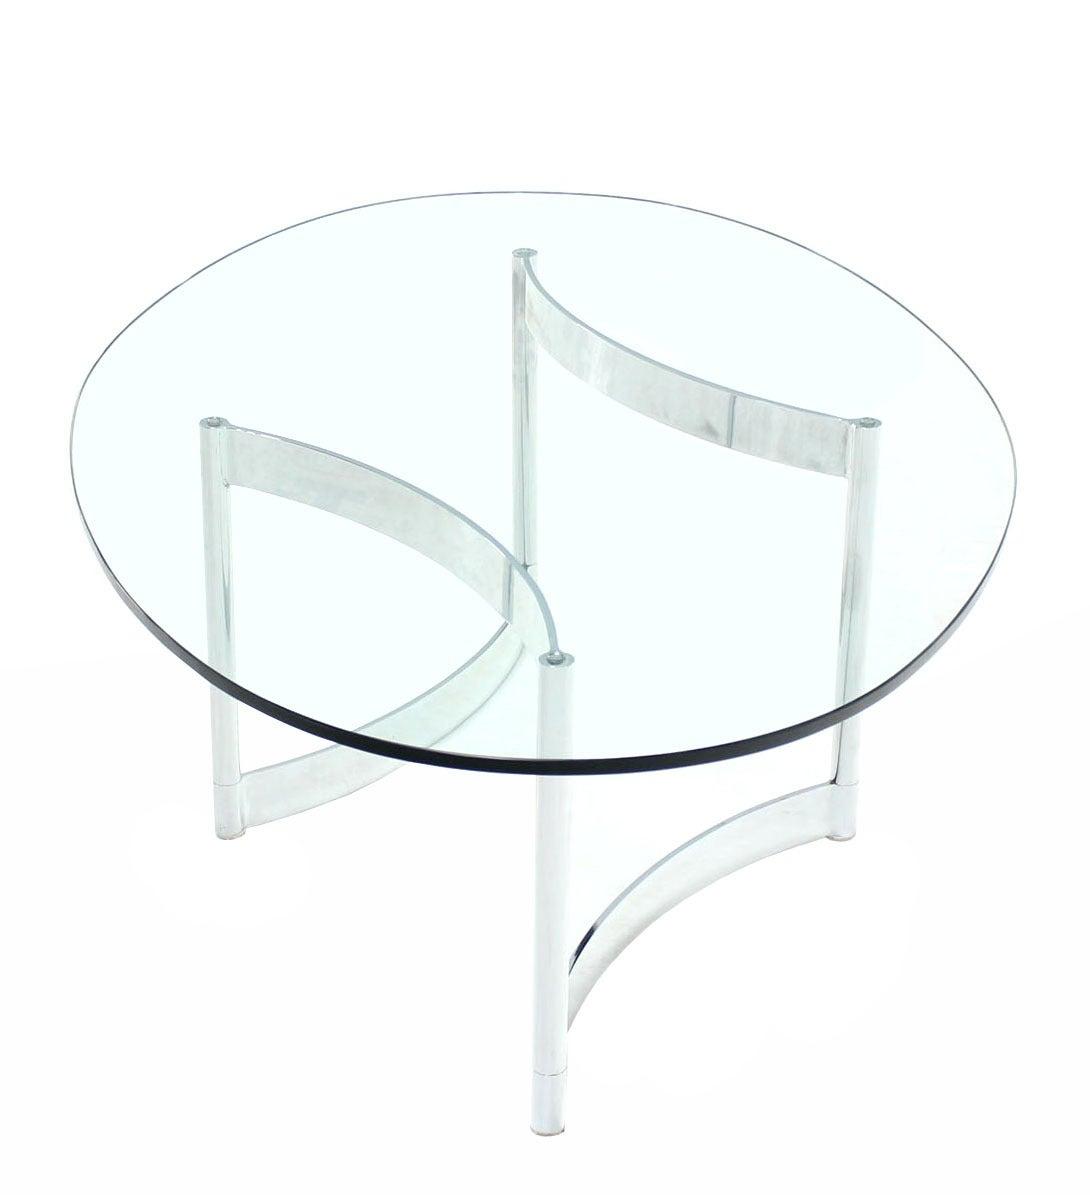 Oval Glass Top Coffee Table With Metal Base: Chrome And Glass Oval Adjustable-Base Coffee Table At 1stdibs